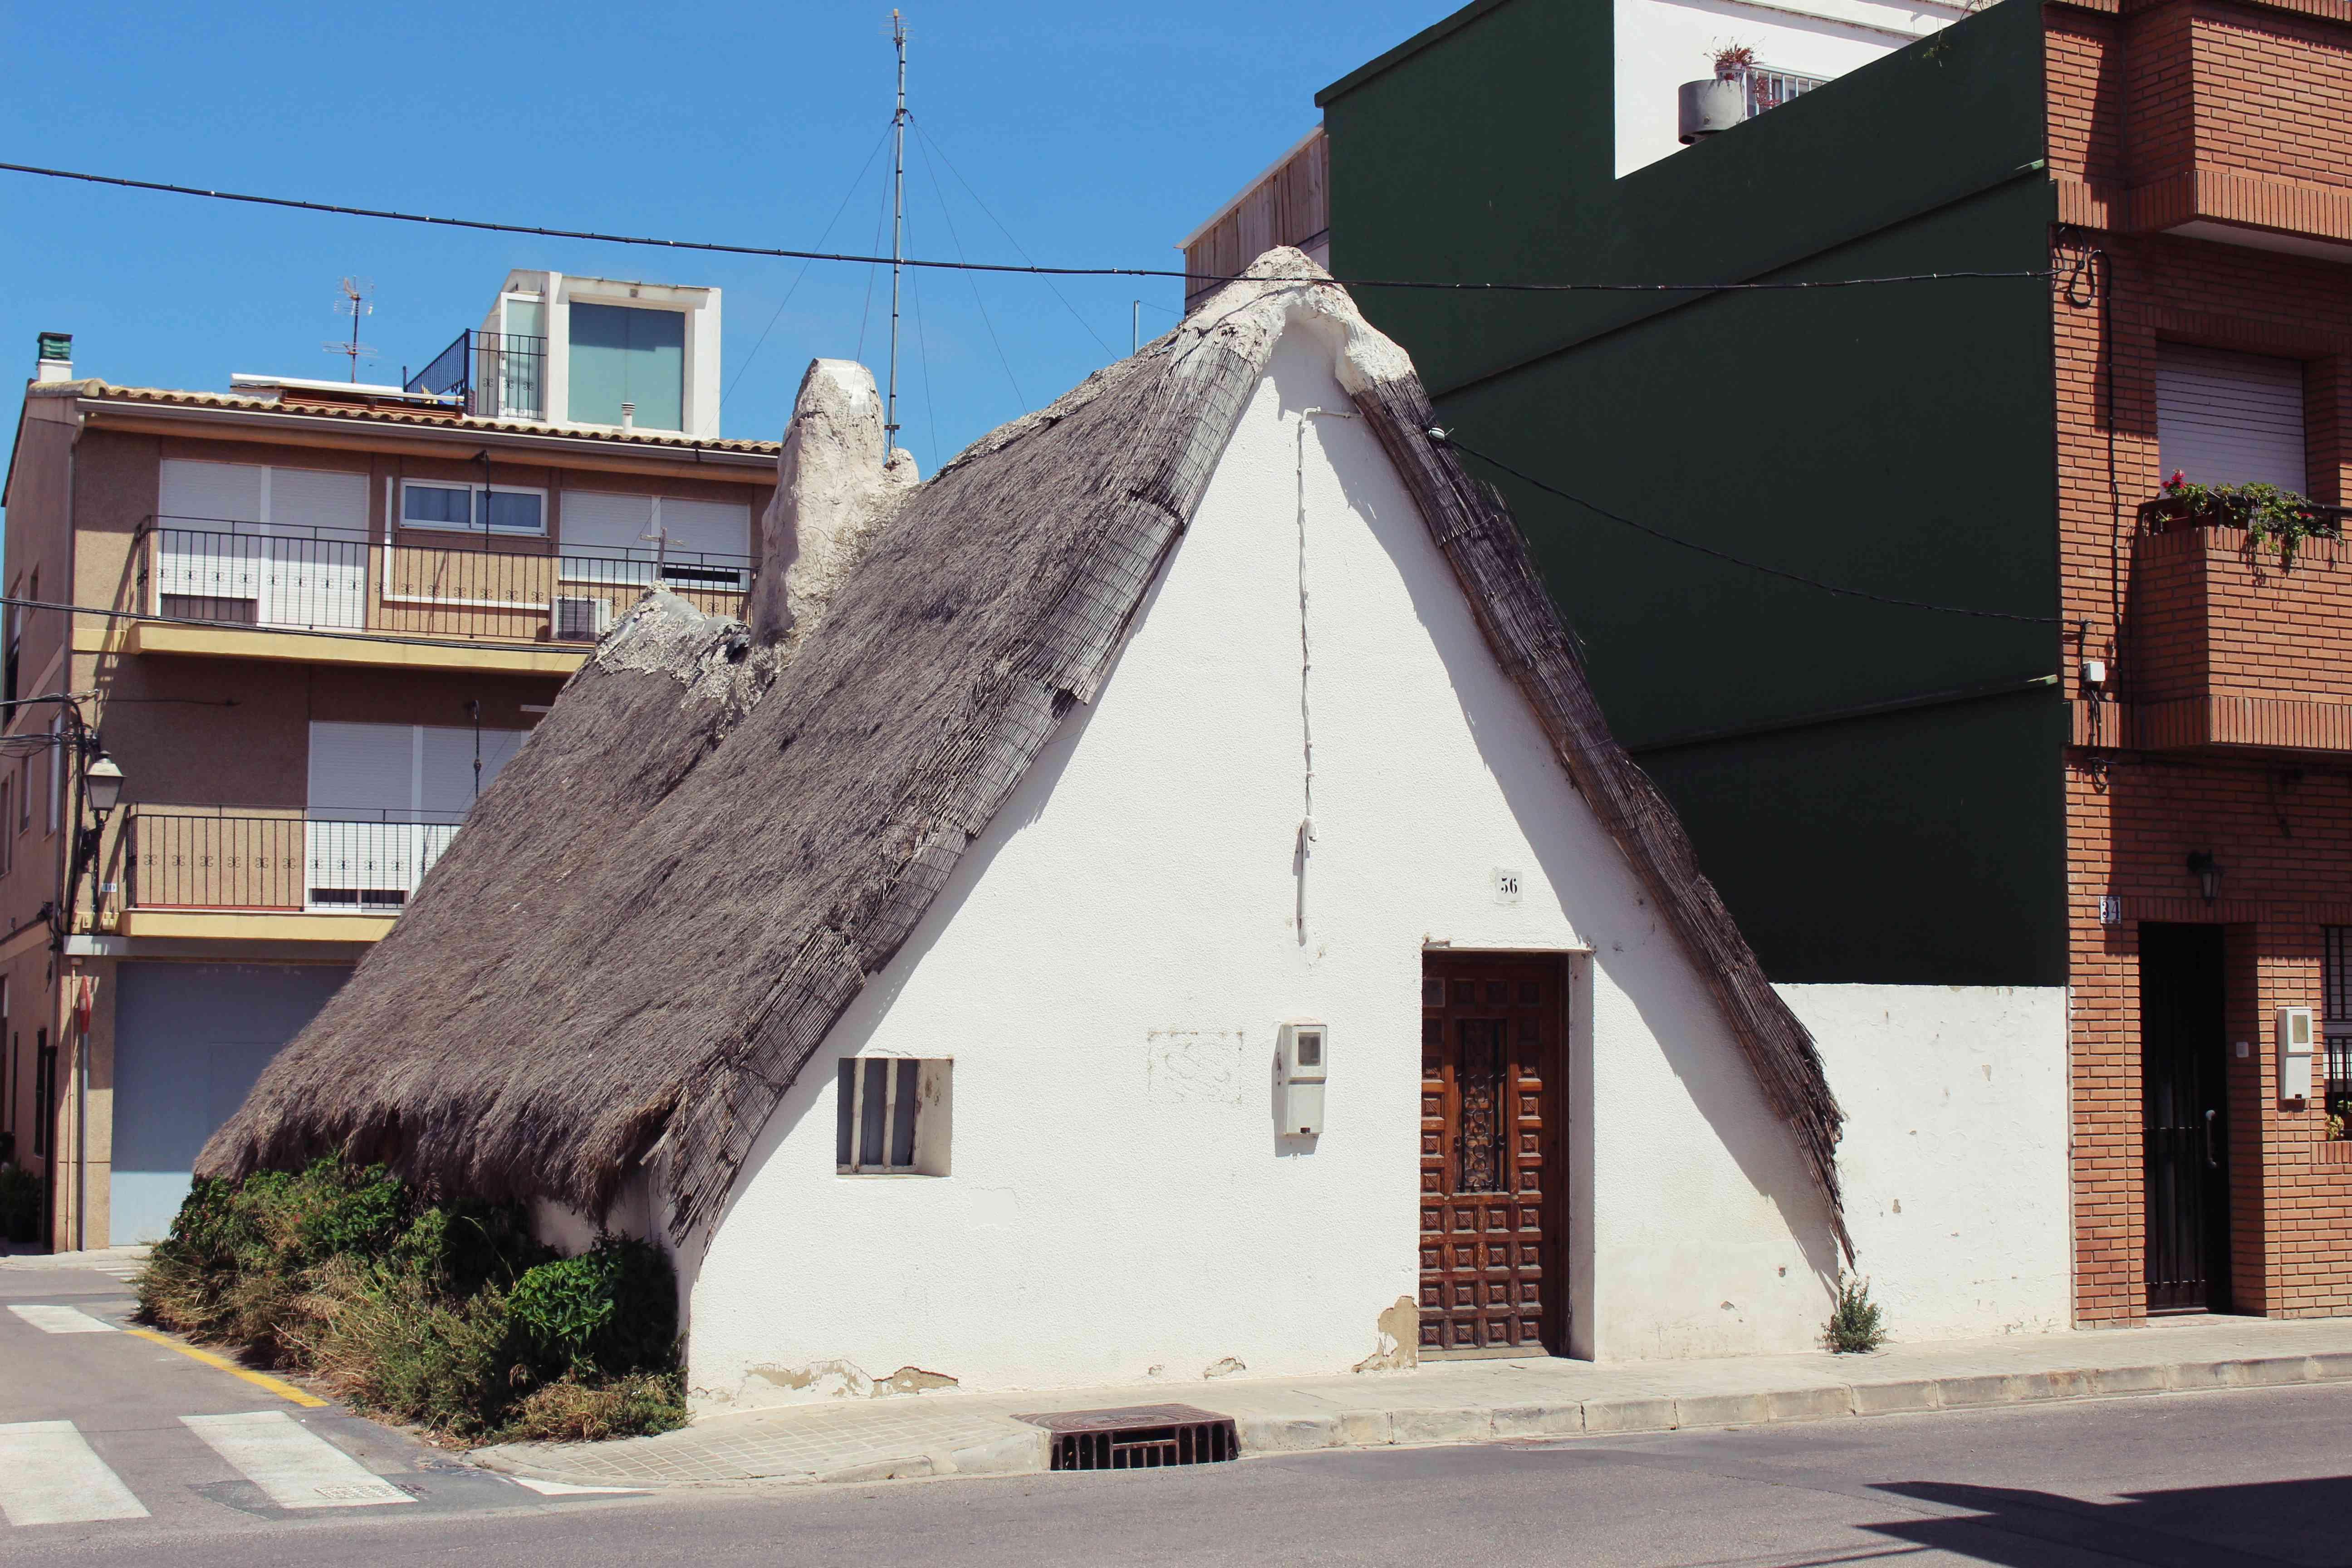 Barraca - a traditional Valencian adobe house in Albufera, near Valencia, Spain